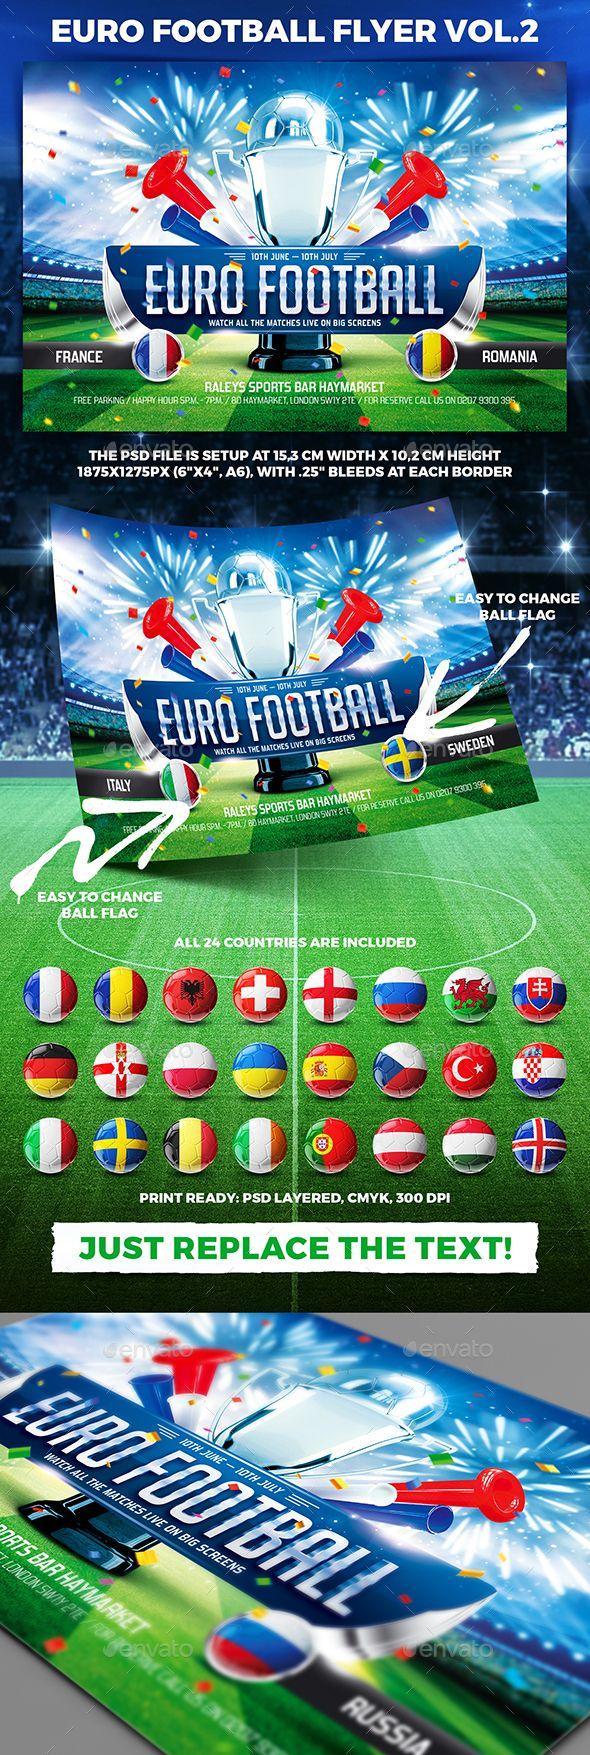 euro football flyer vol2